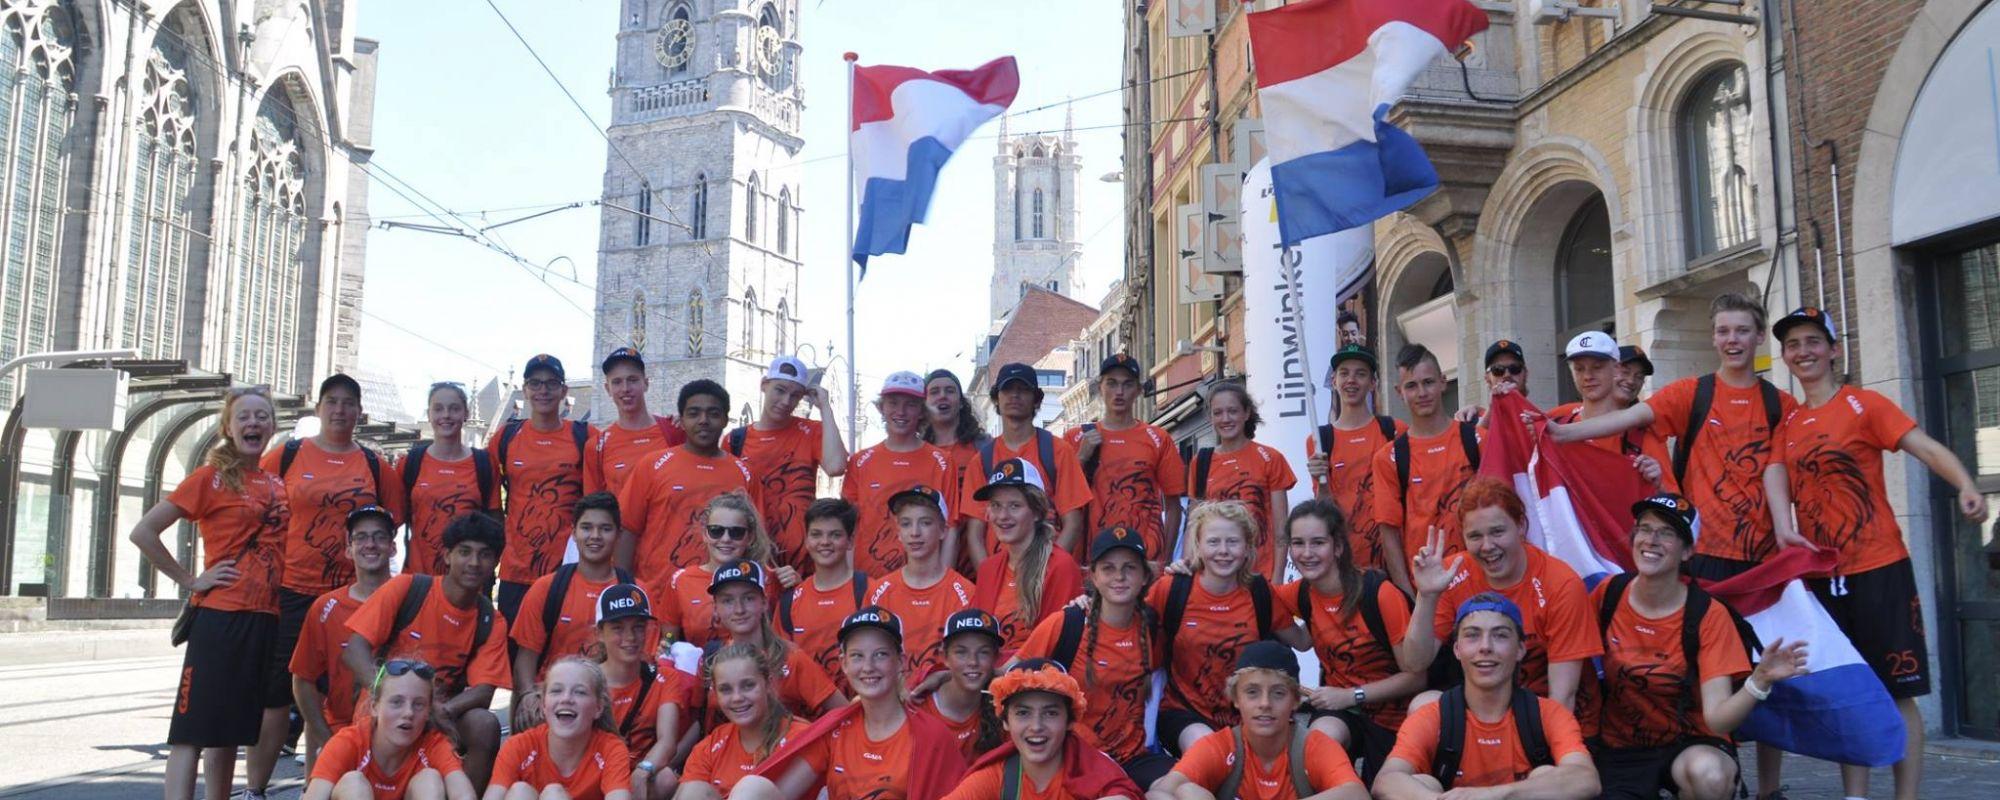 EYUC Gent 2016